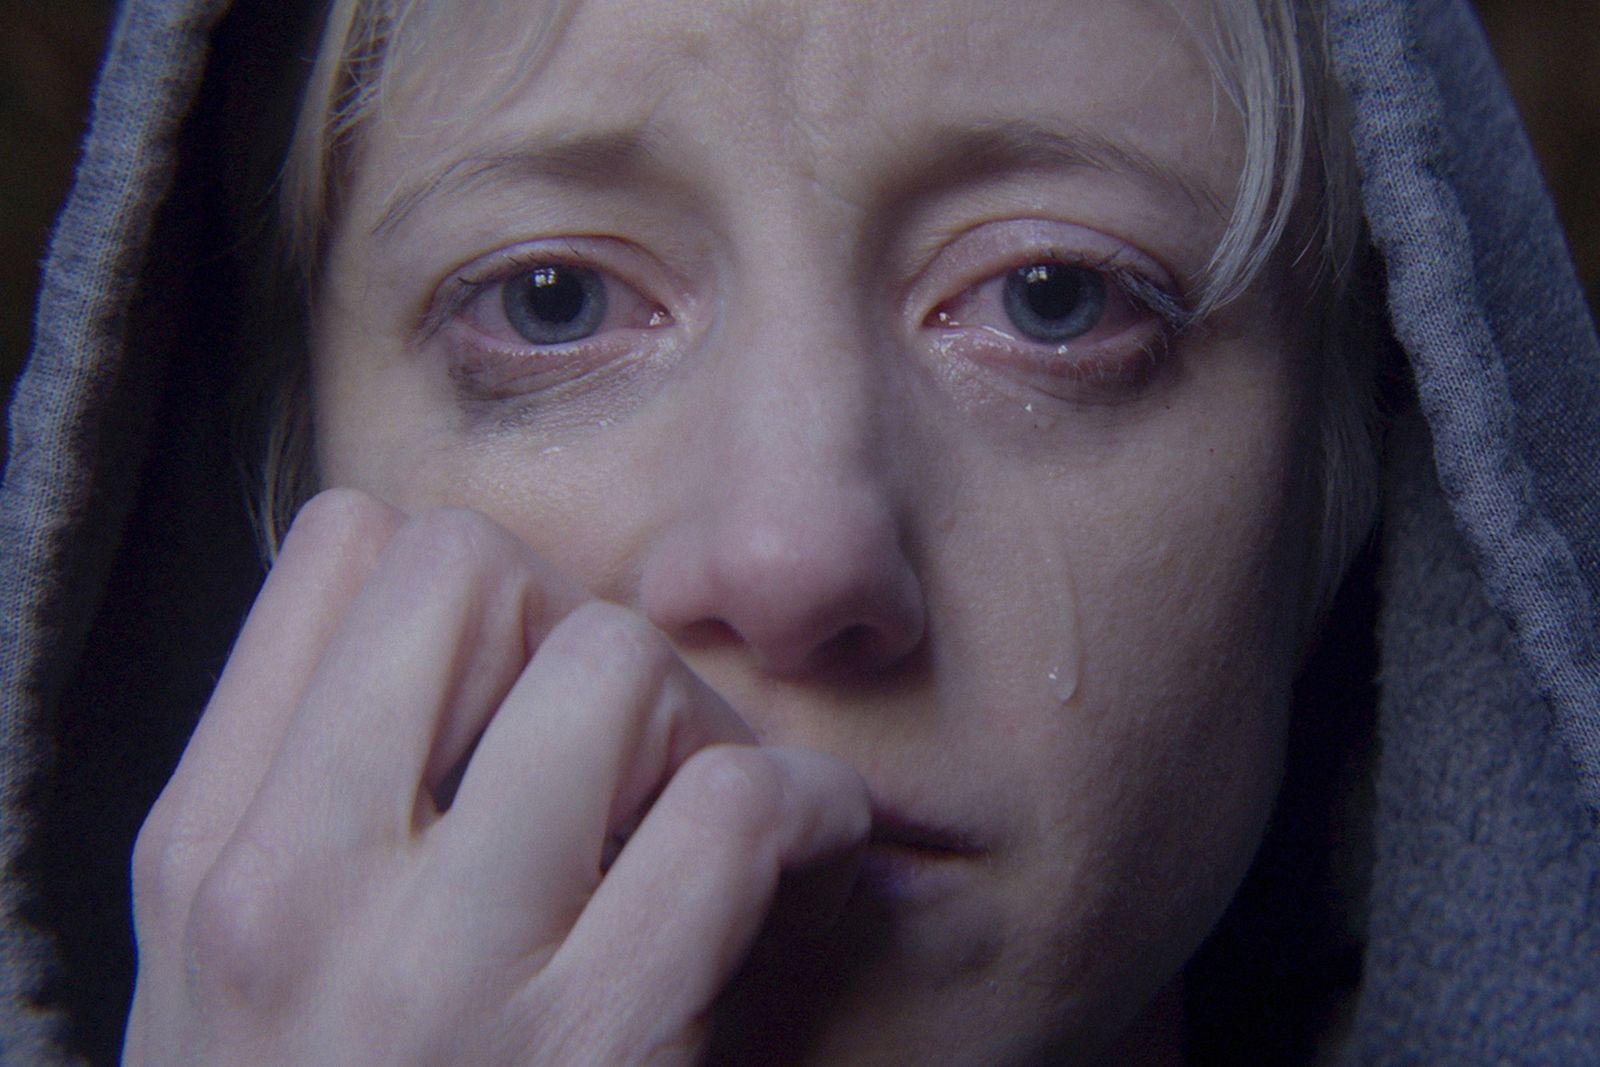 best original movies series coming streaming platforms 2019 Stranger Things amazon black mirror